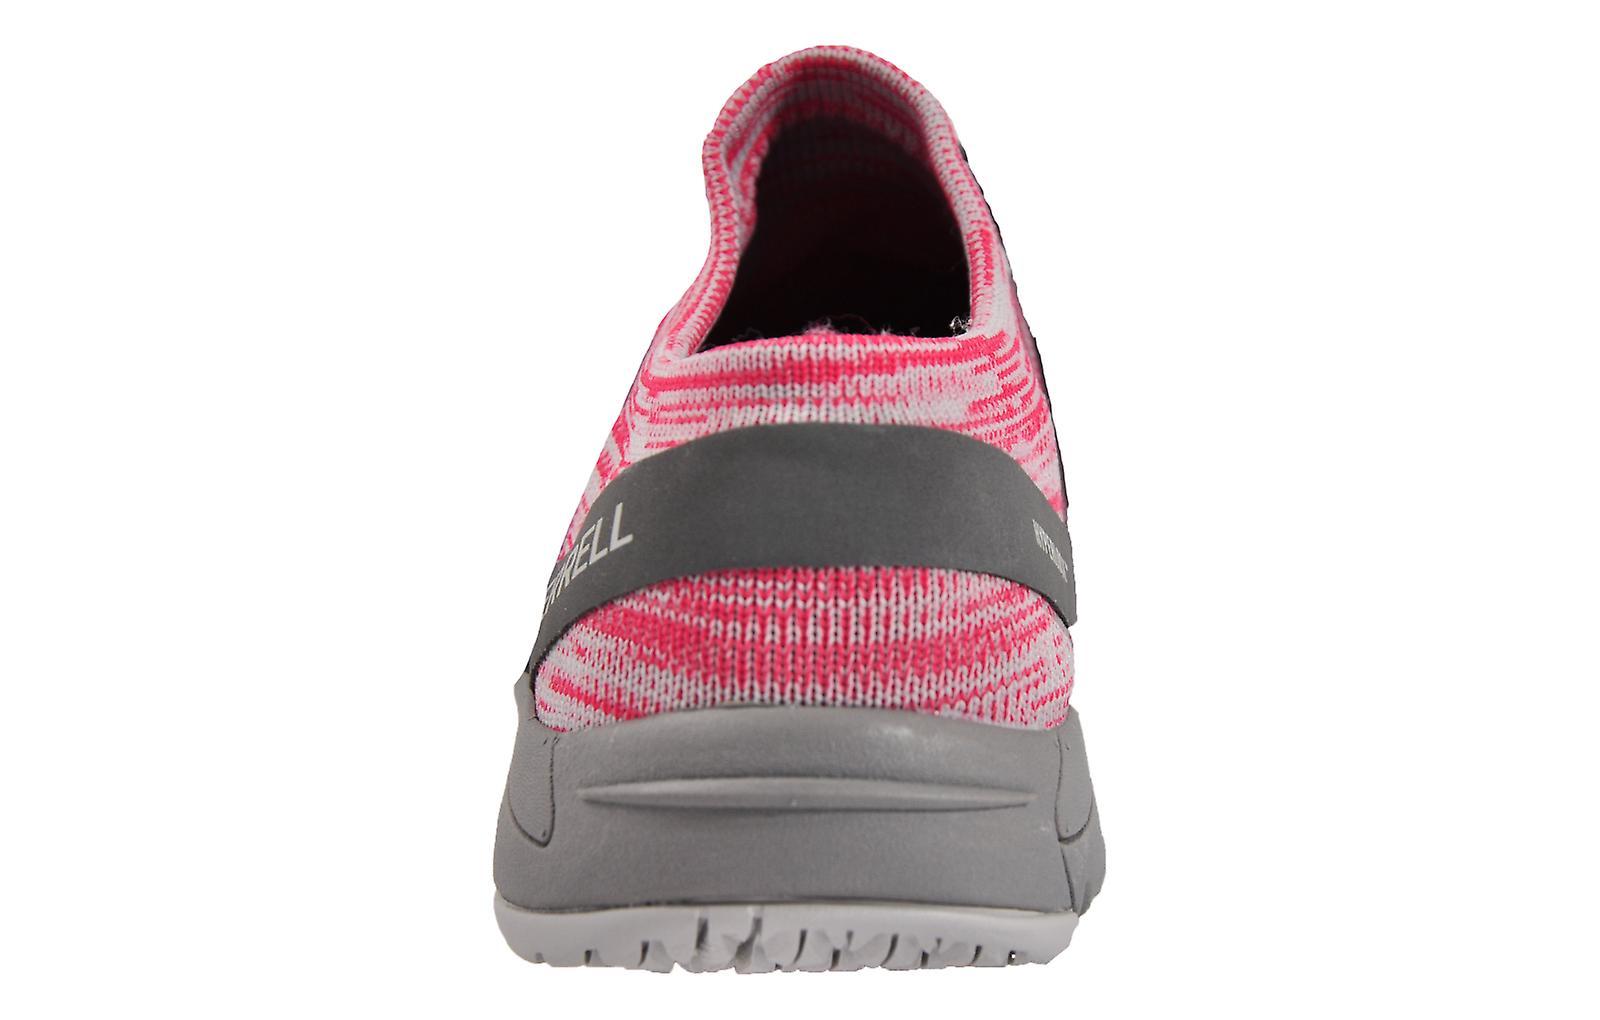 Merrell Bare Access Flex Knit Rose Red / Grey